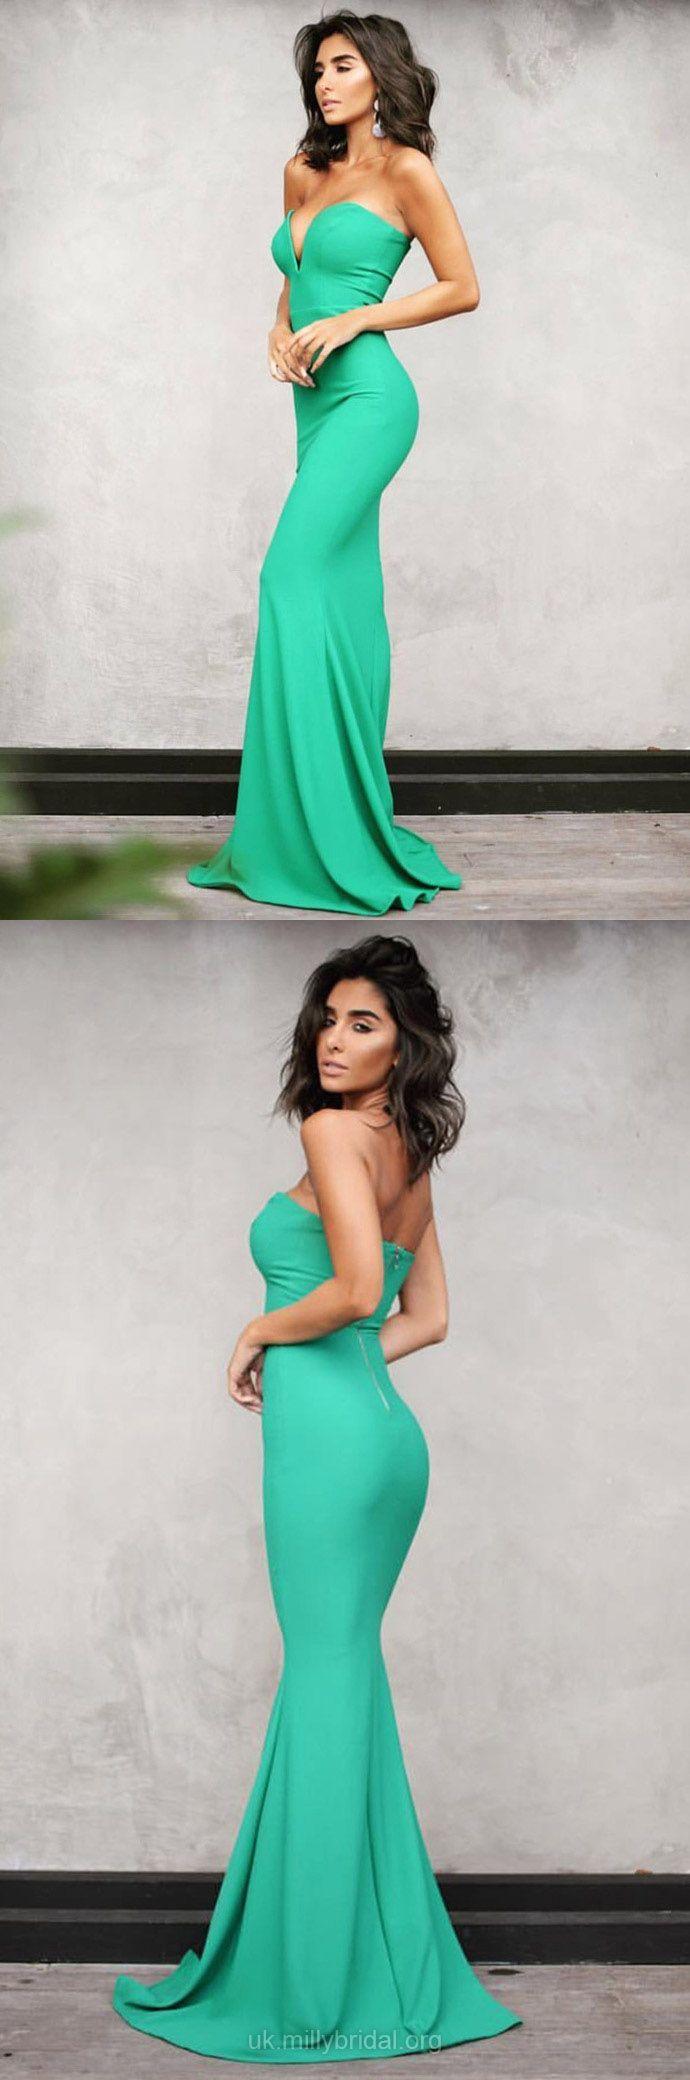 Prom dresses green prom dresses long prom dresses jersey prom